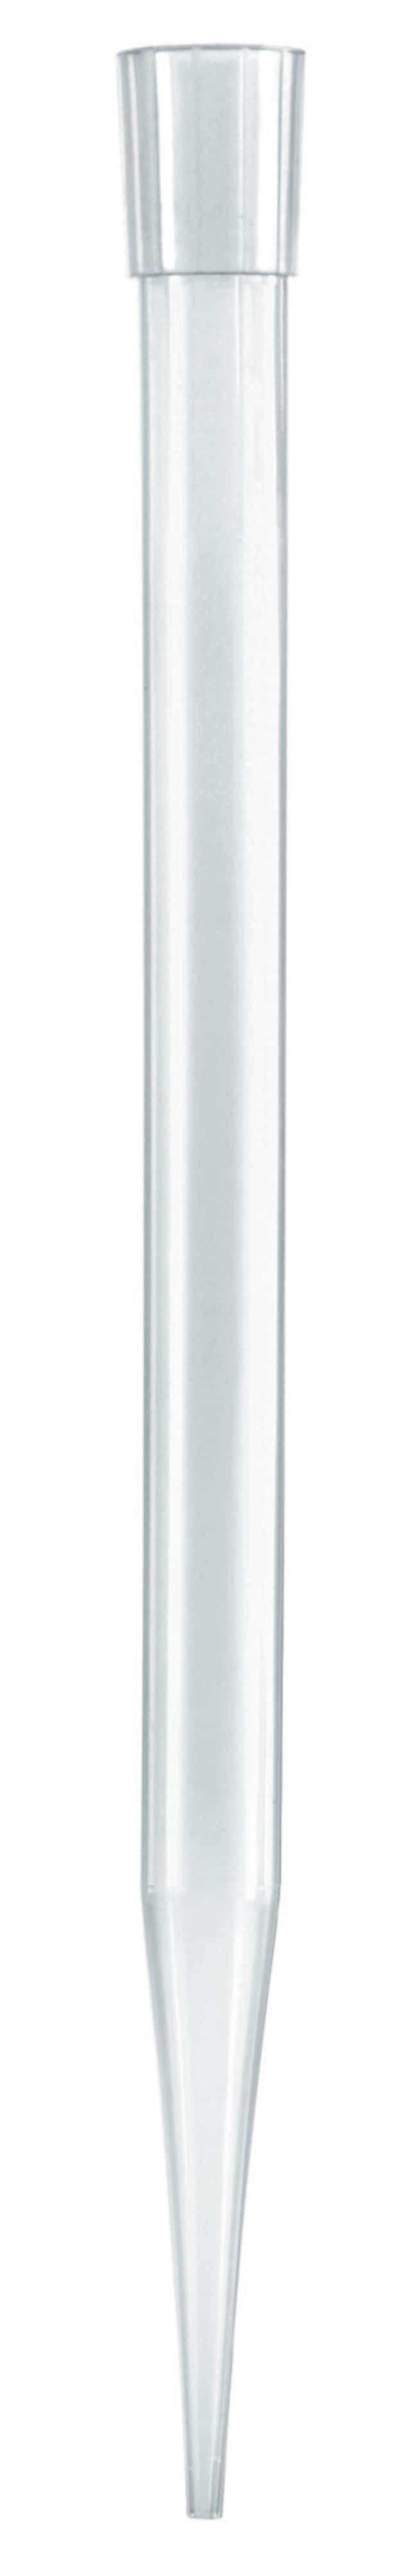 Vitlab™Pipette Tips Volume: 0.5 to 5mL Vitlab™Pipette Tips